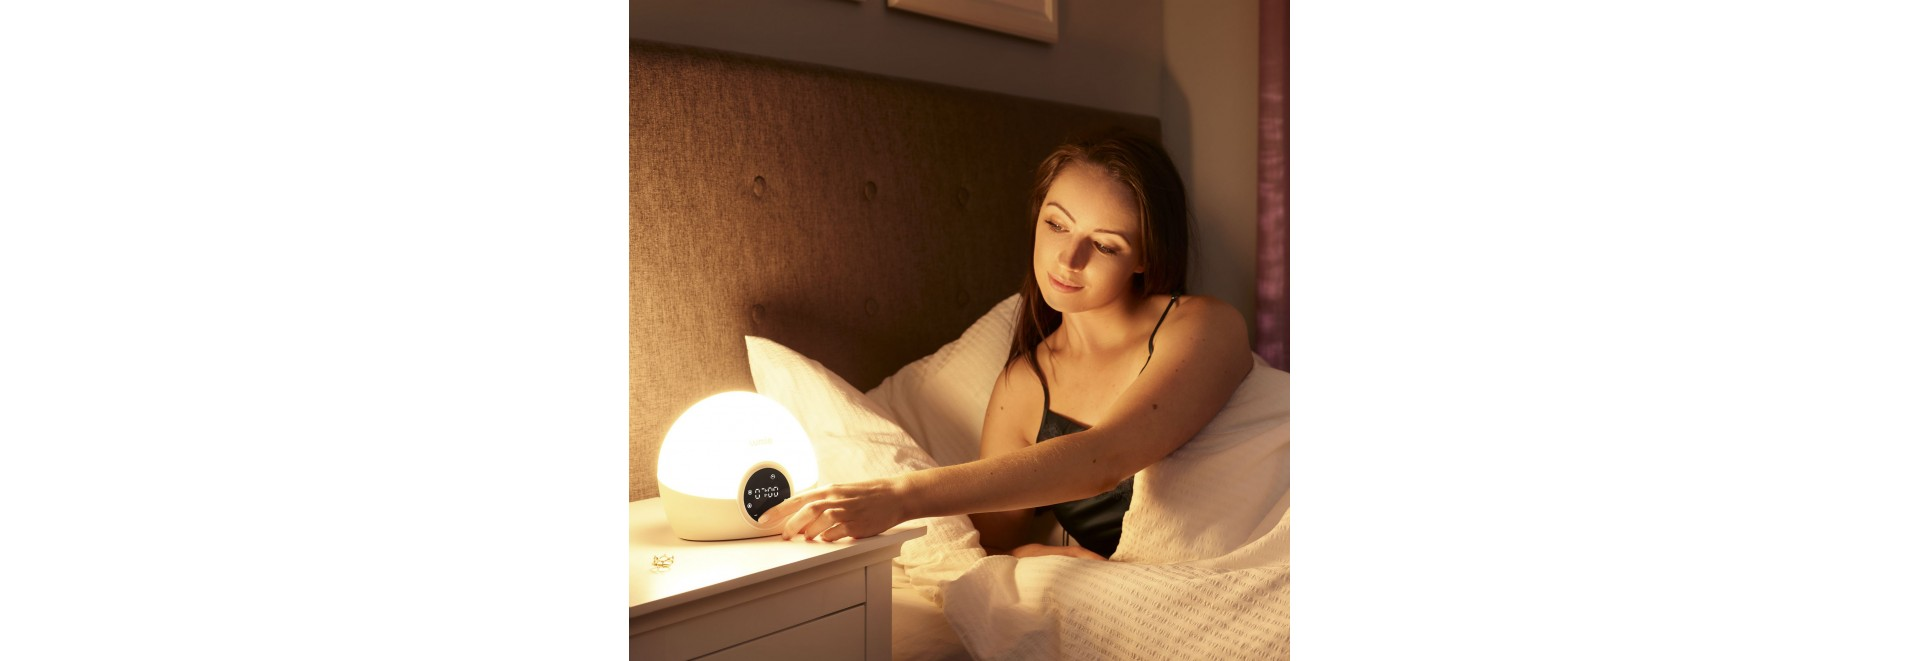 réveils lumière simulateurs d'aube - luminotherapie - medi-lum